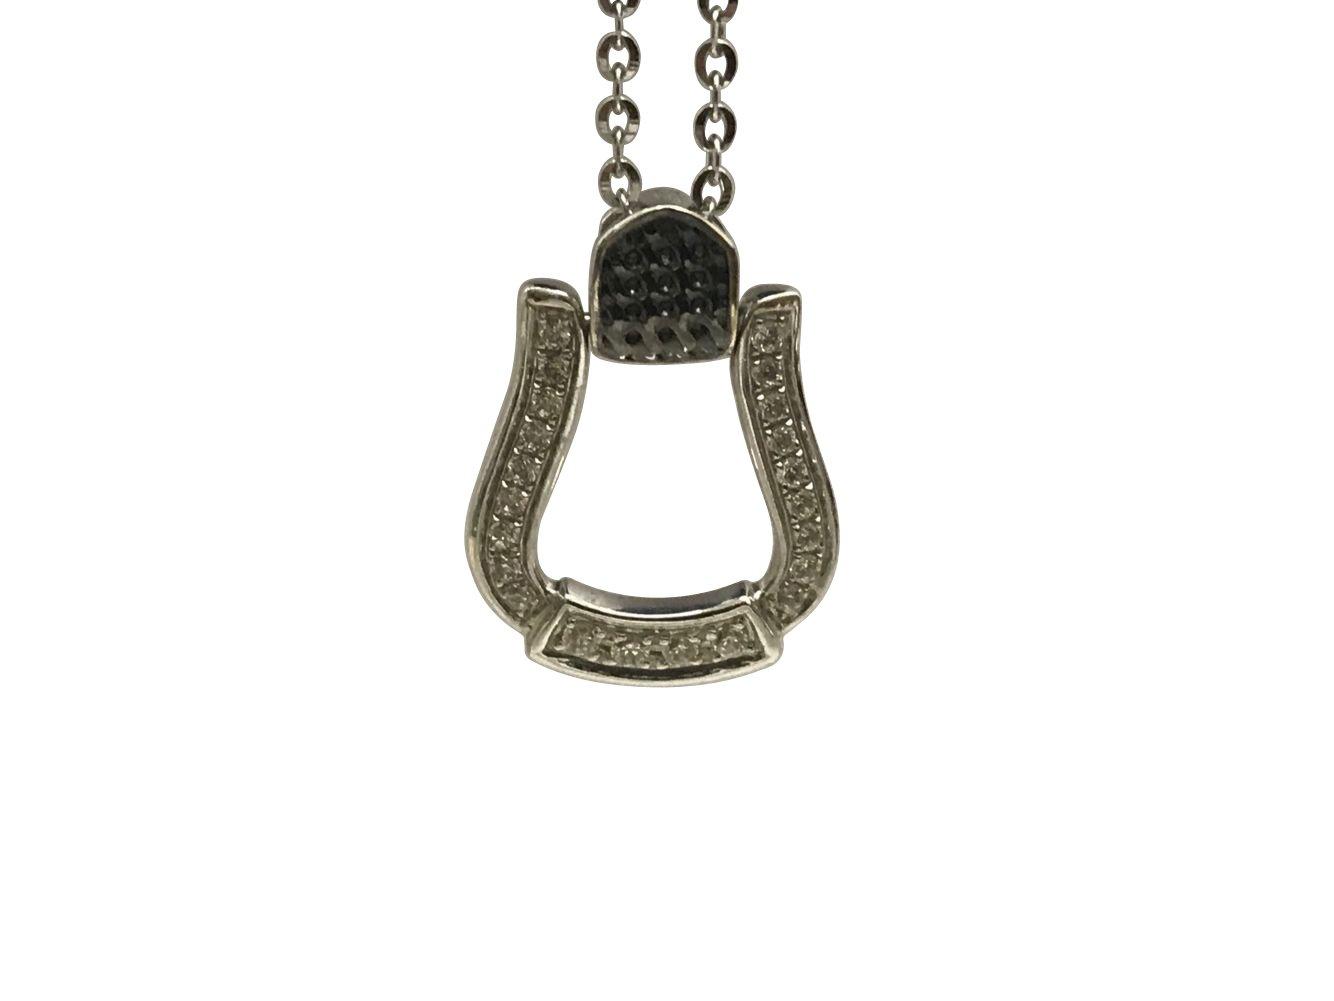 9K Zircon Horseshoe Journey Style Necklace-A